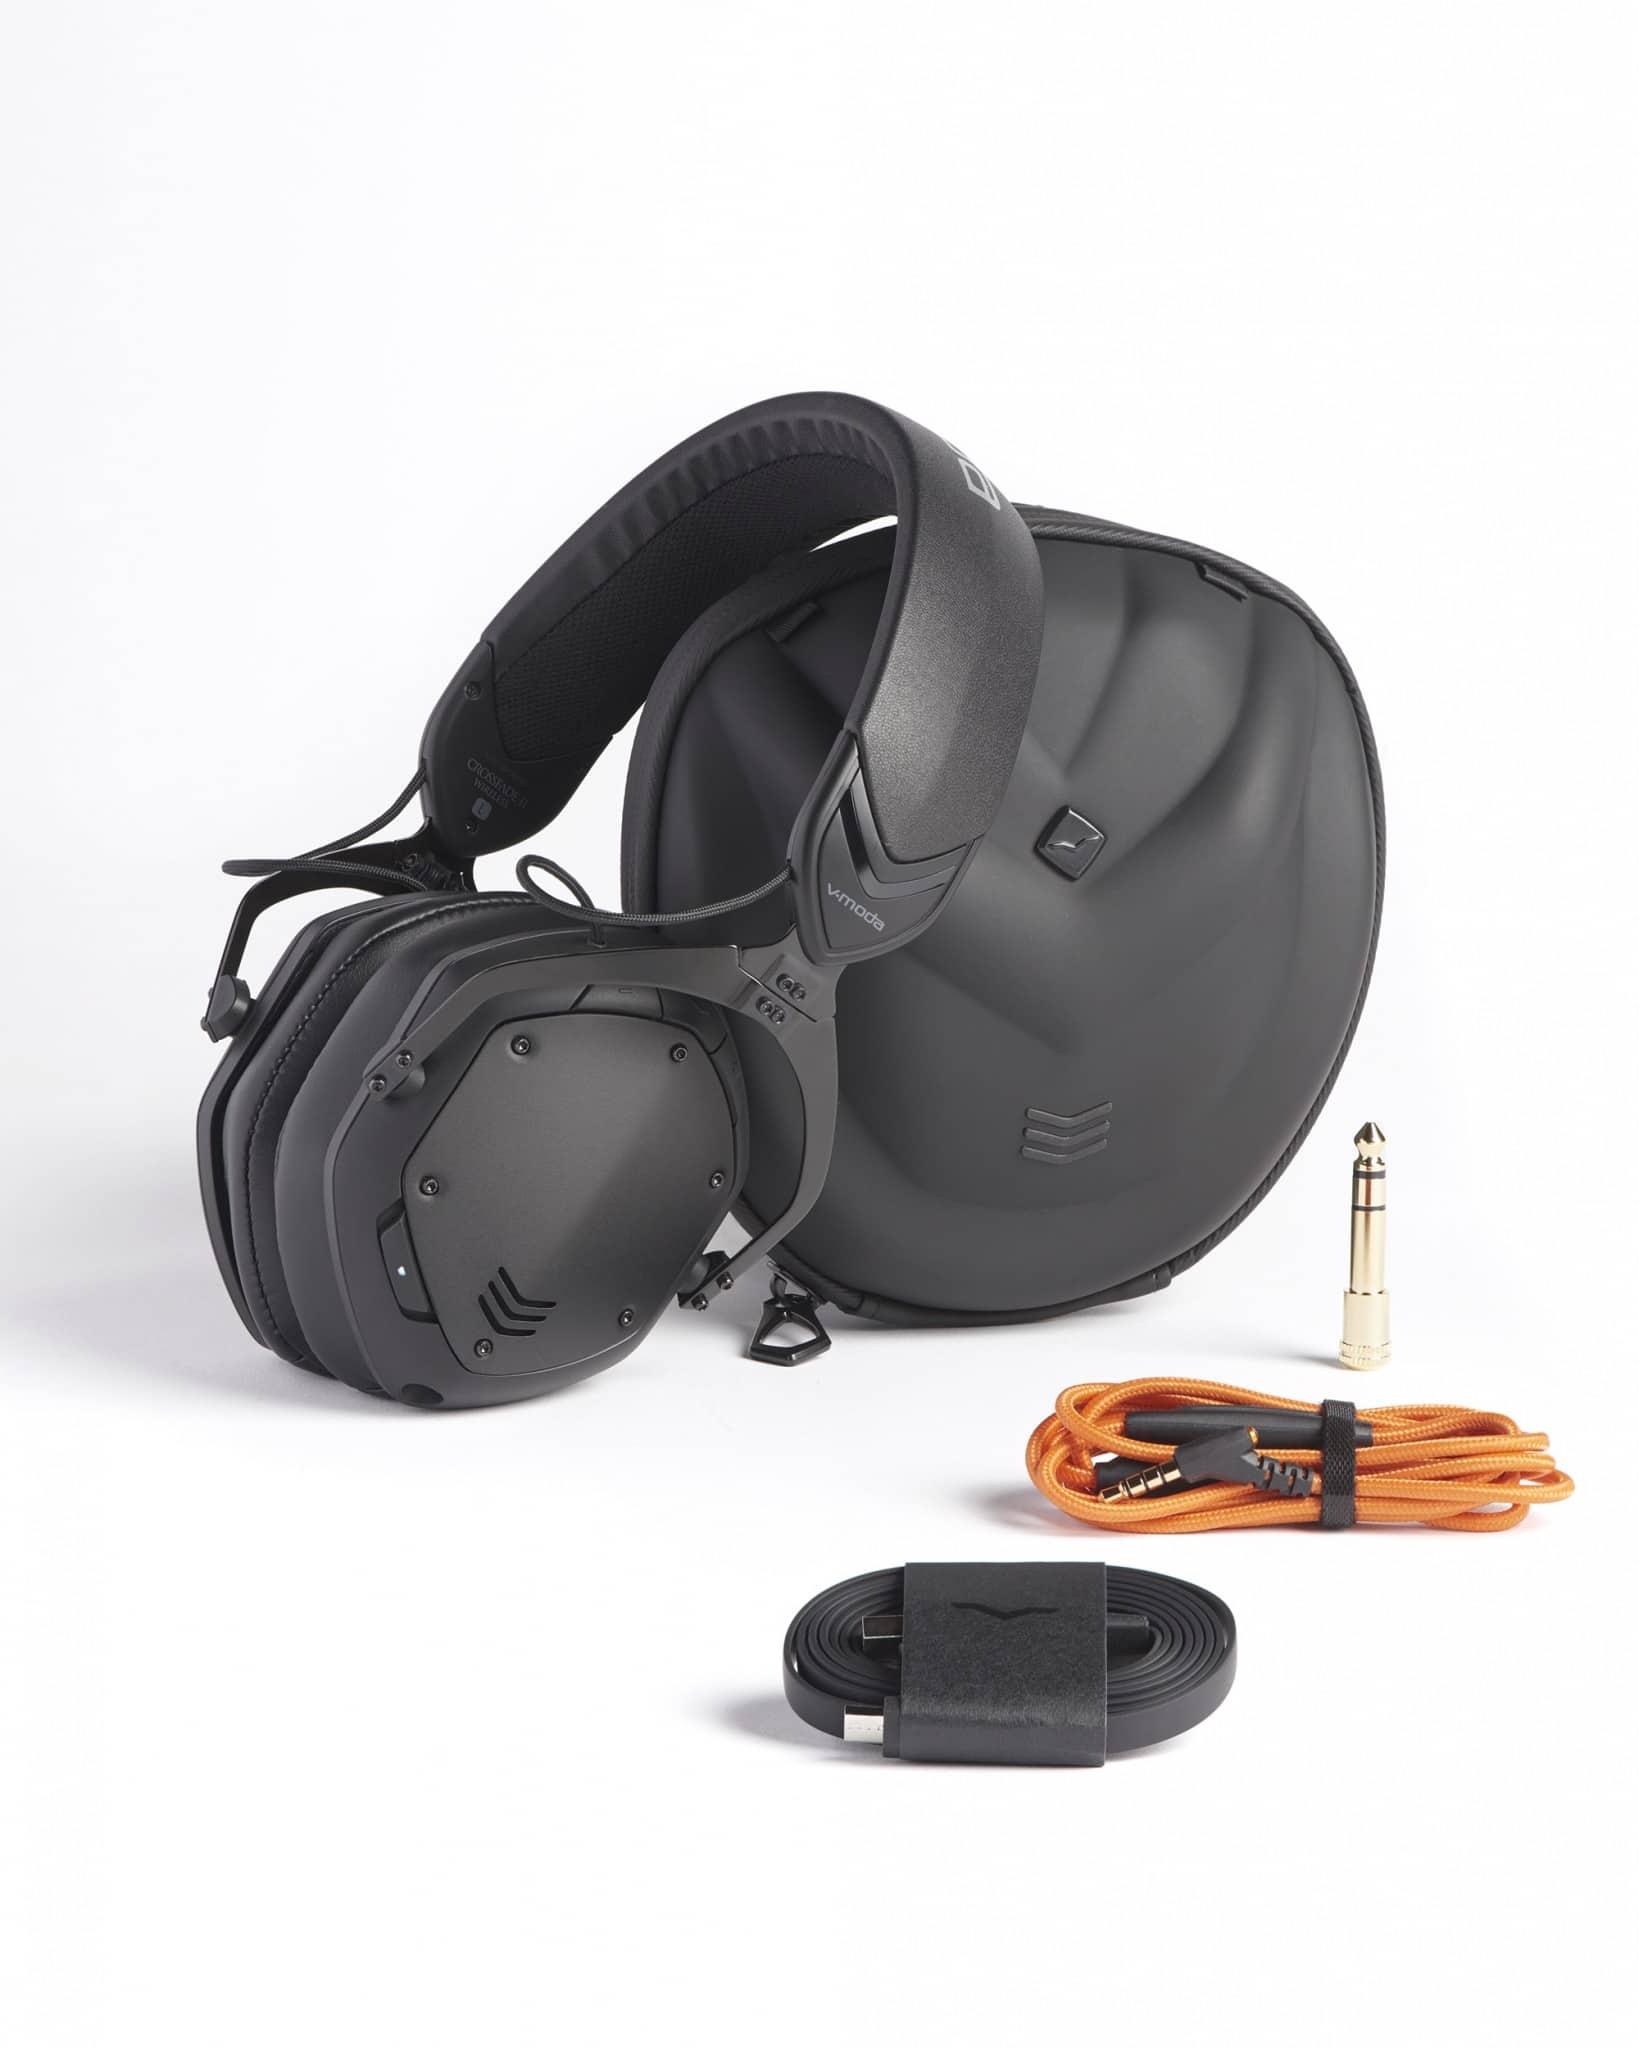 XFBT2_matteblack_accessories